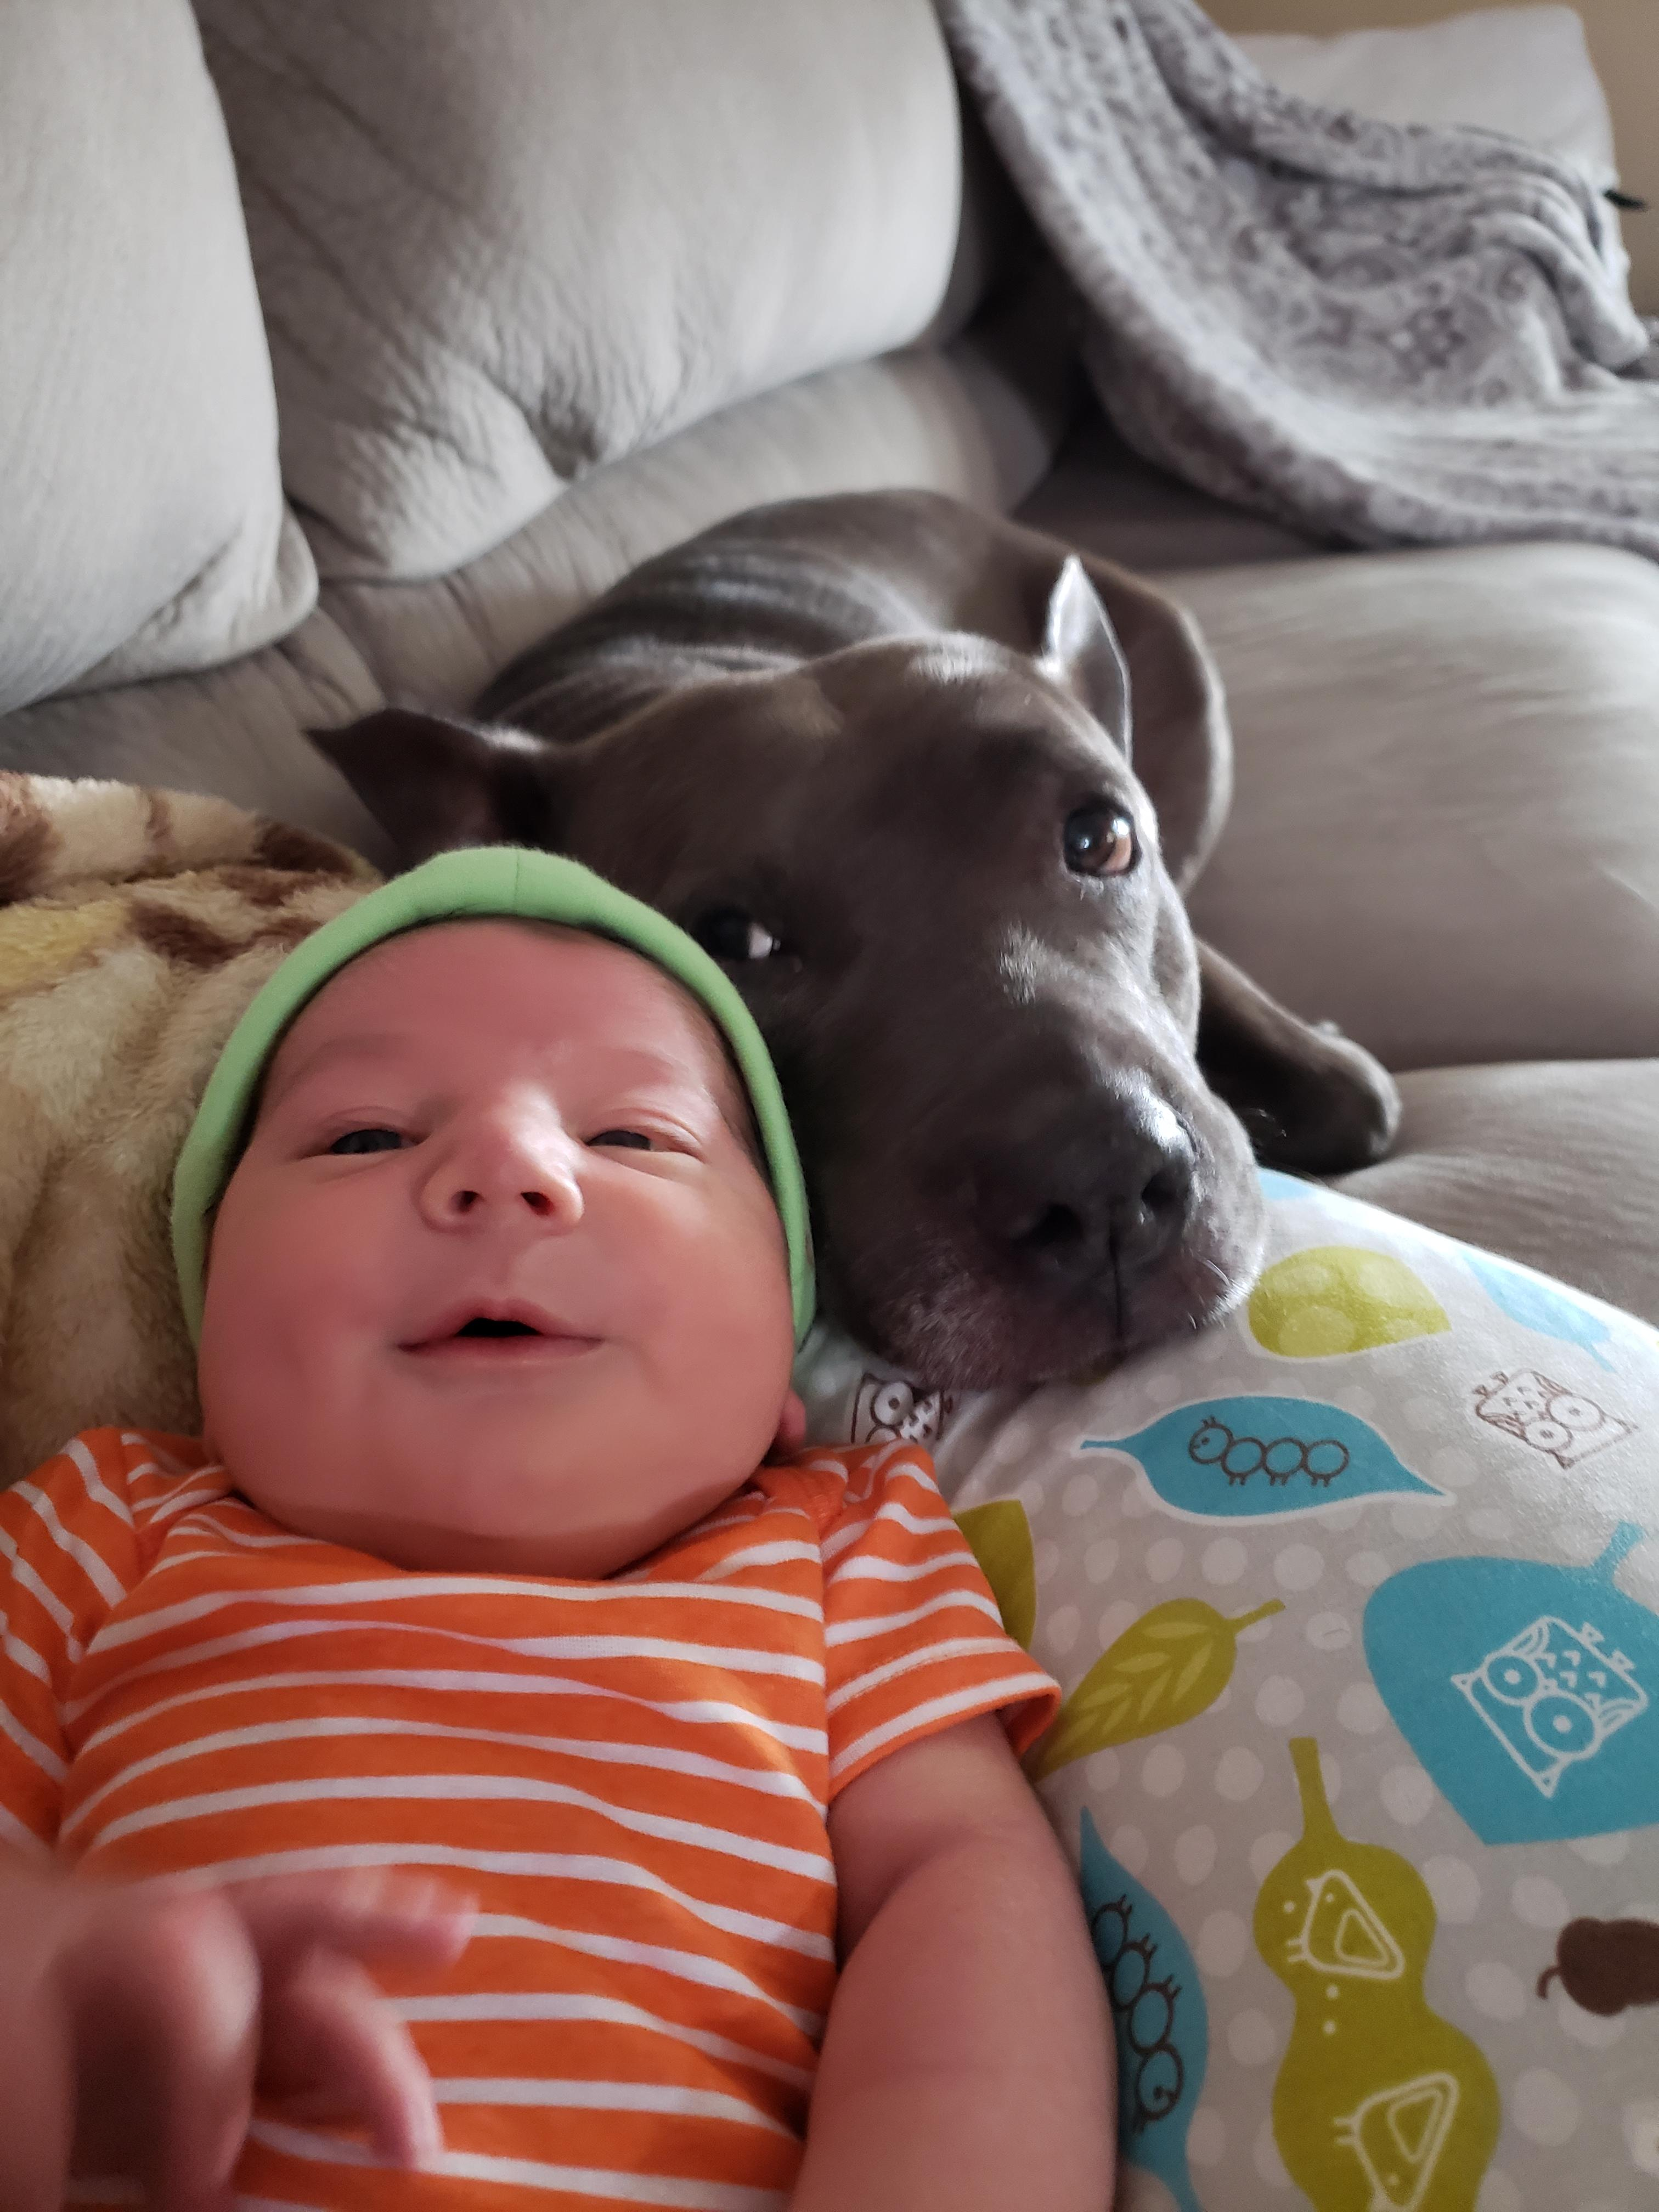 Newborn Baby Pitbulls : newborn, pitbulls, Pitbull, Newborn, Sight., Girl!